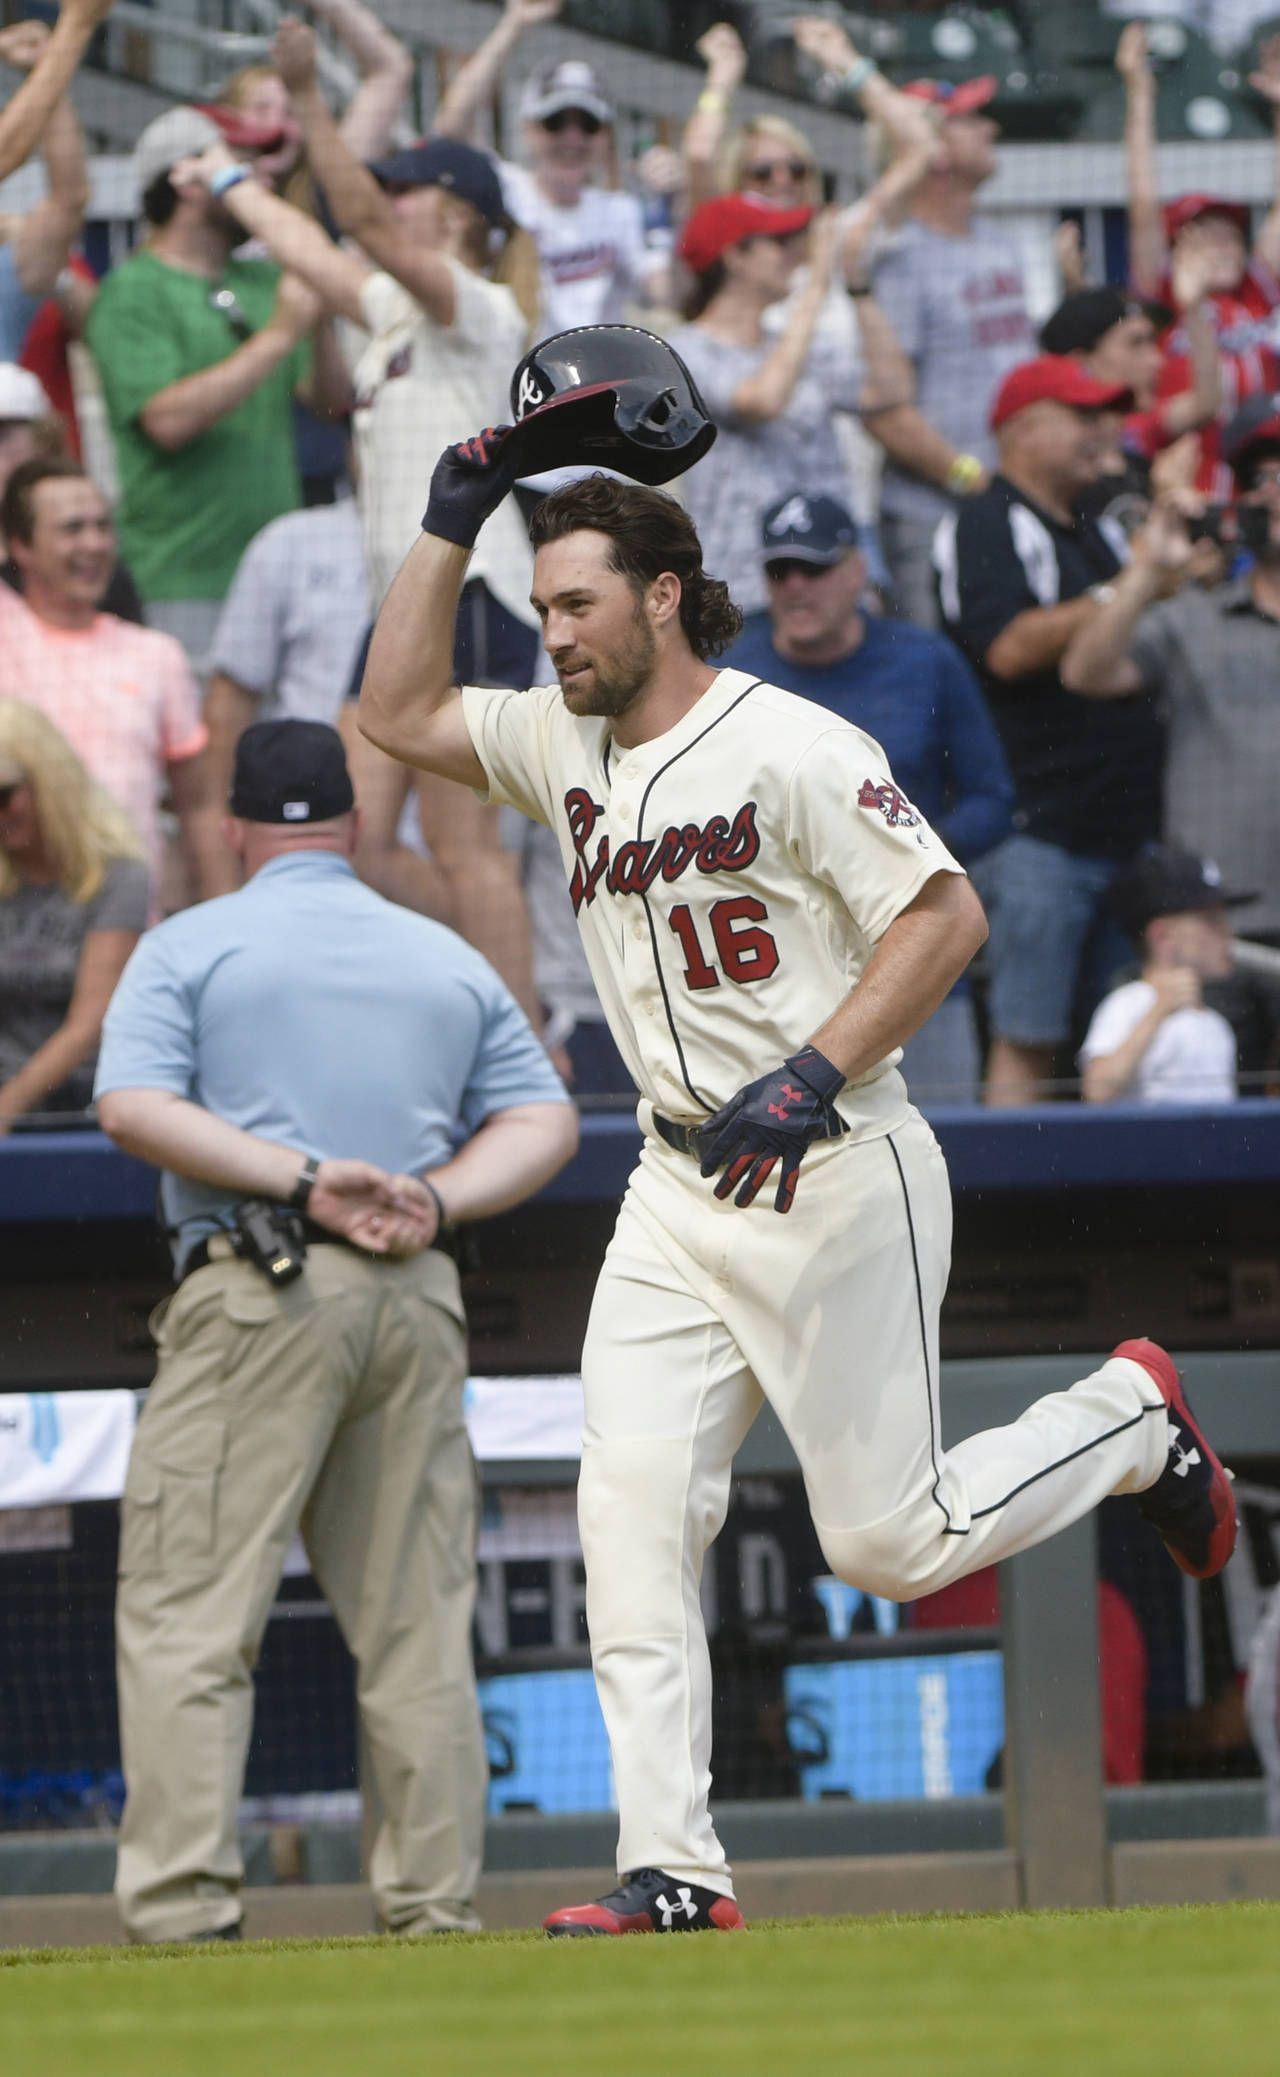 Atlanta Braves Shortstop Charlie Culberson 16 Runs The Baseline After Hitting A Two Run Home Run To End A Baseb Braves Atlanta Braves Atlanta Braves Baseball